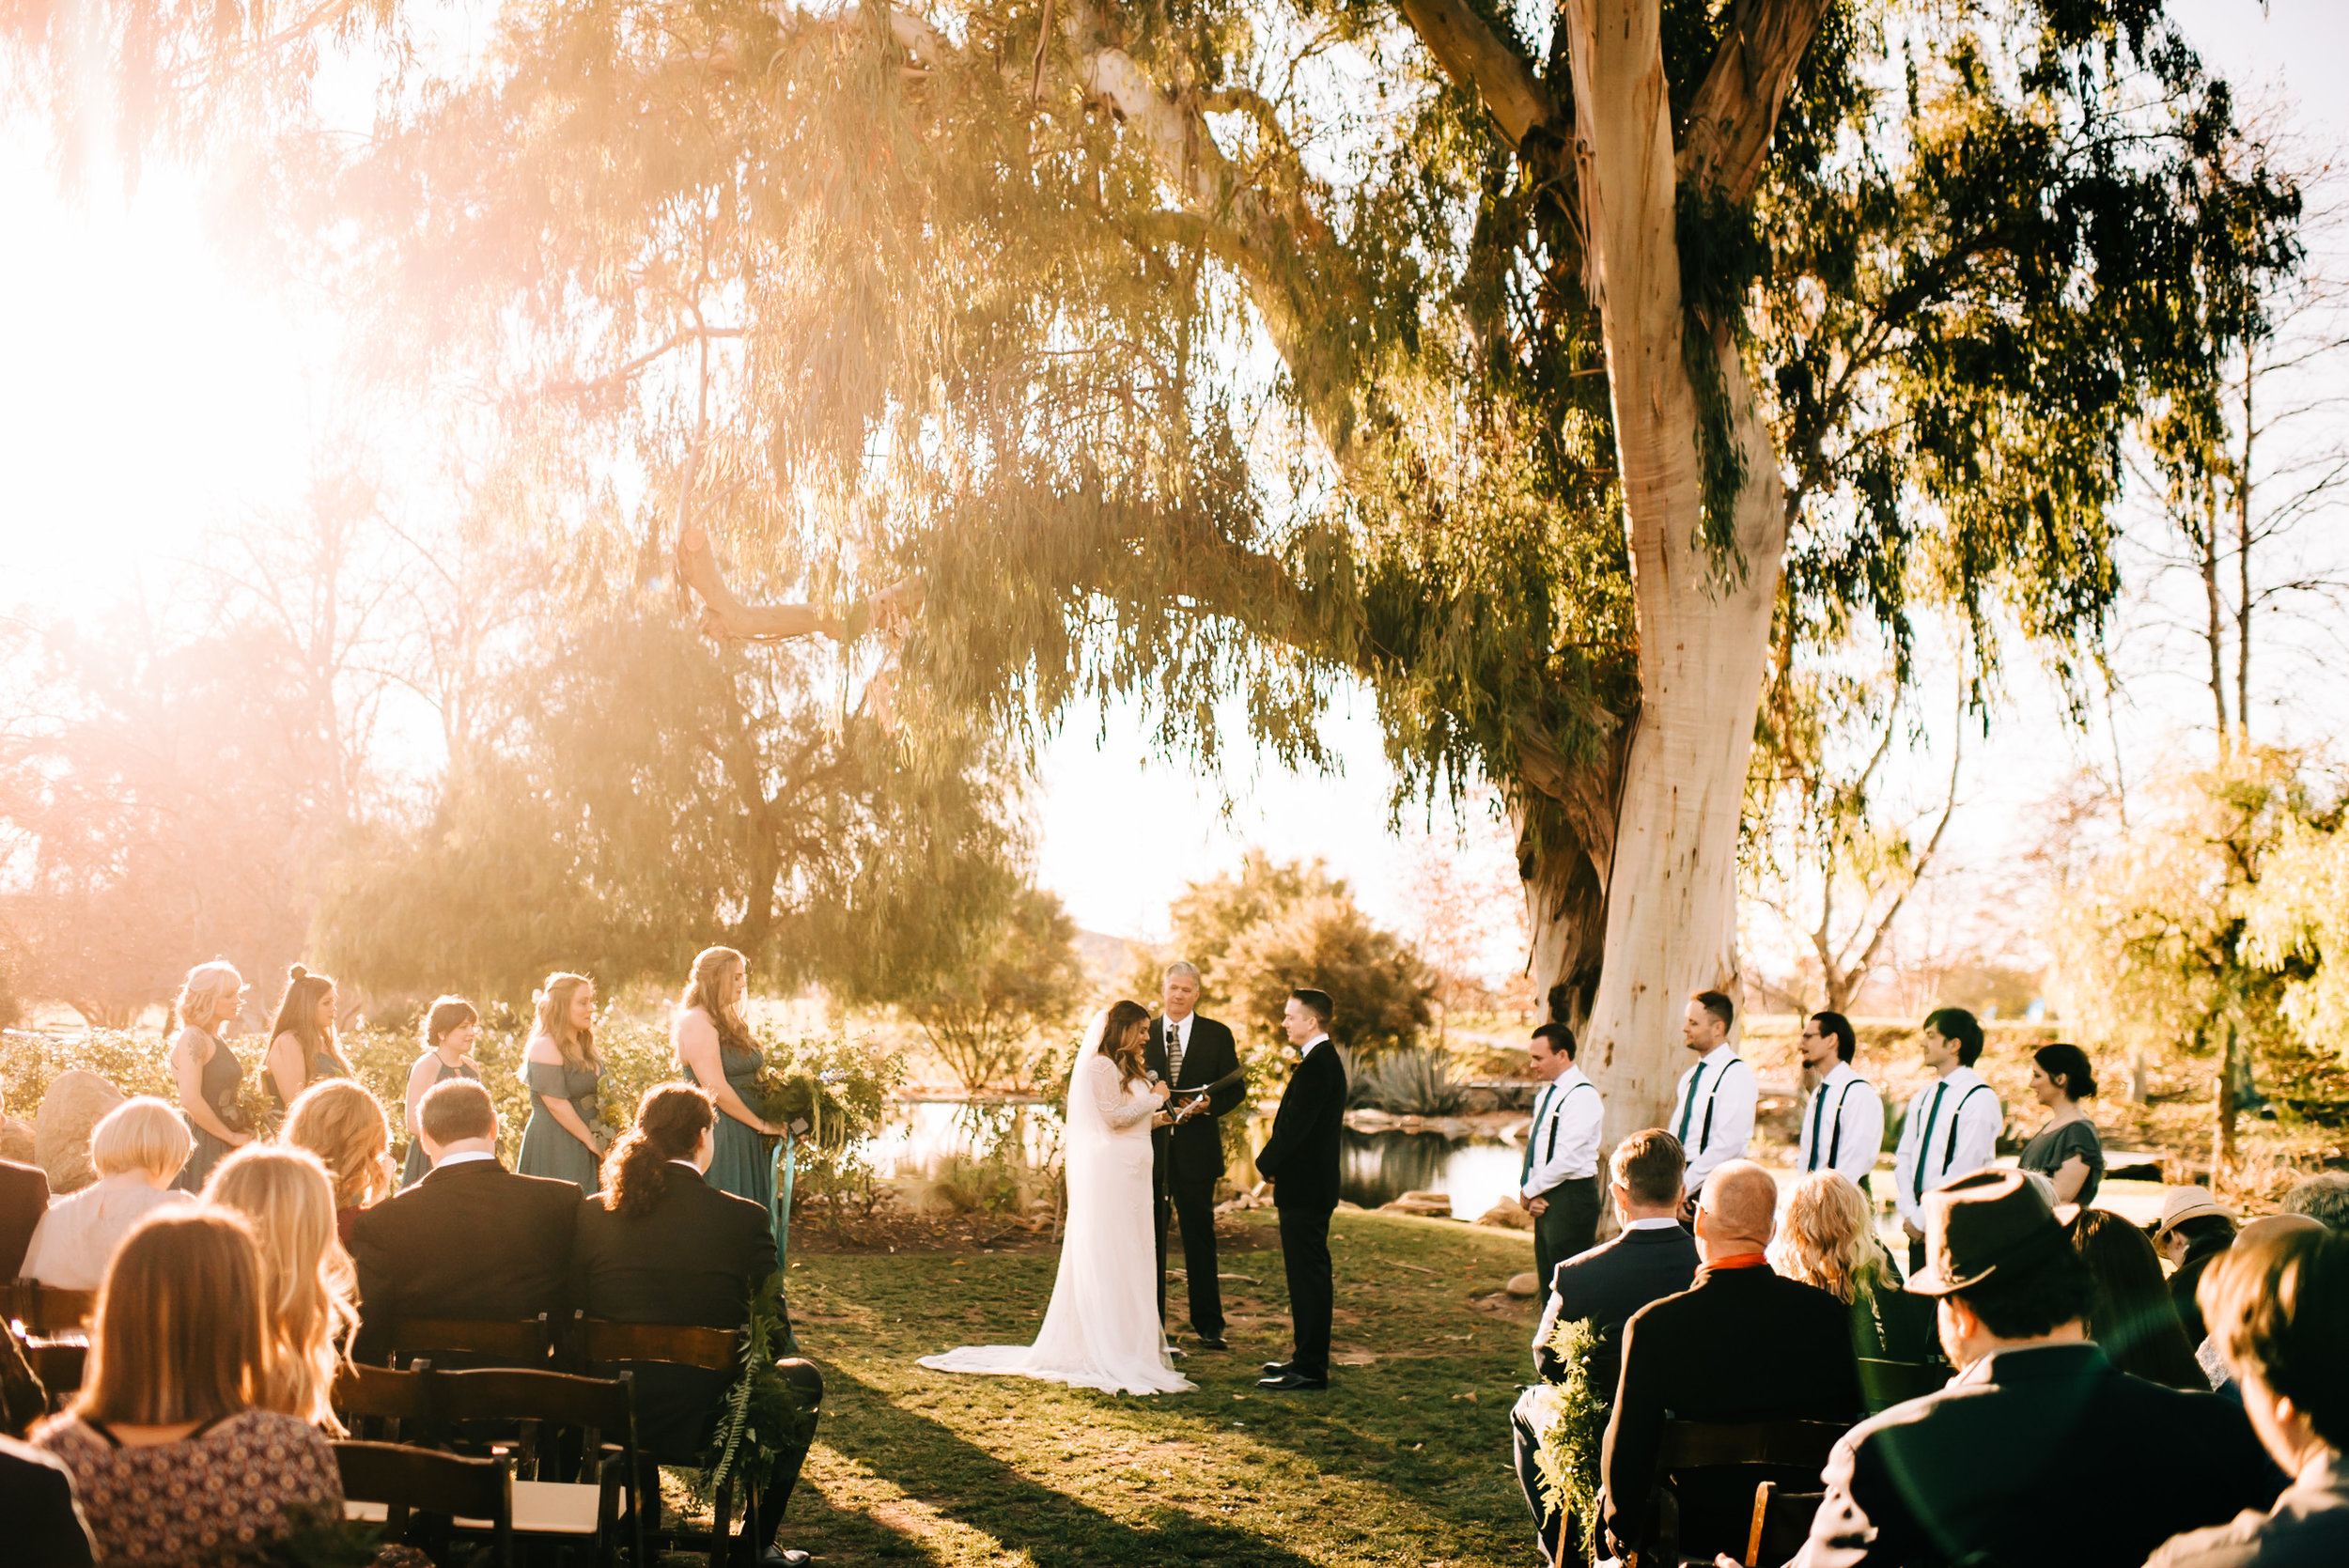 bay area nontraditional wedding photographer southern california boho wedding love light magic san francisco oakland northern california-574.jpg